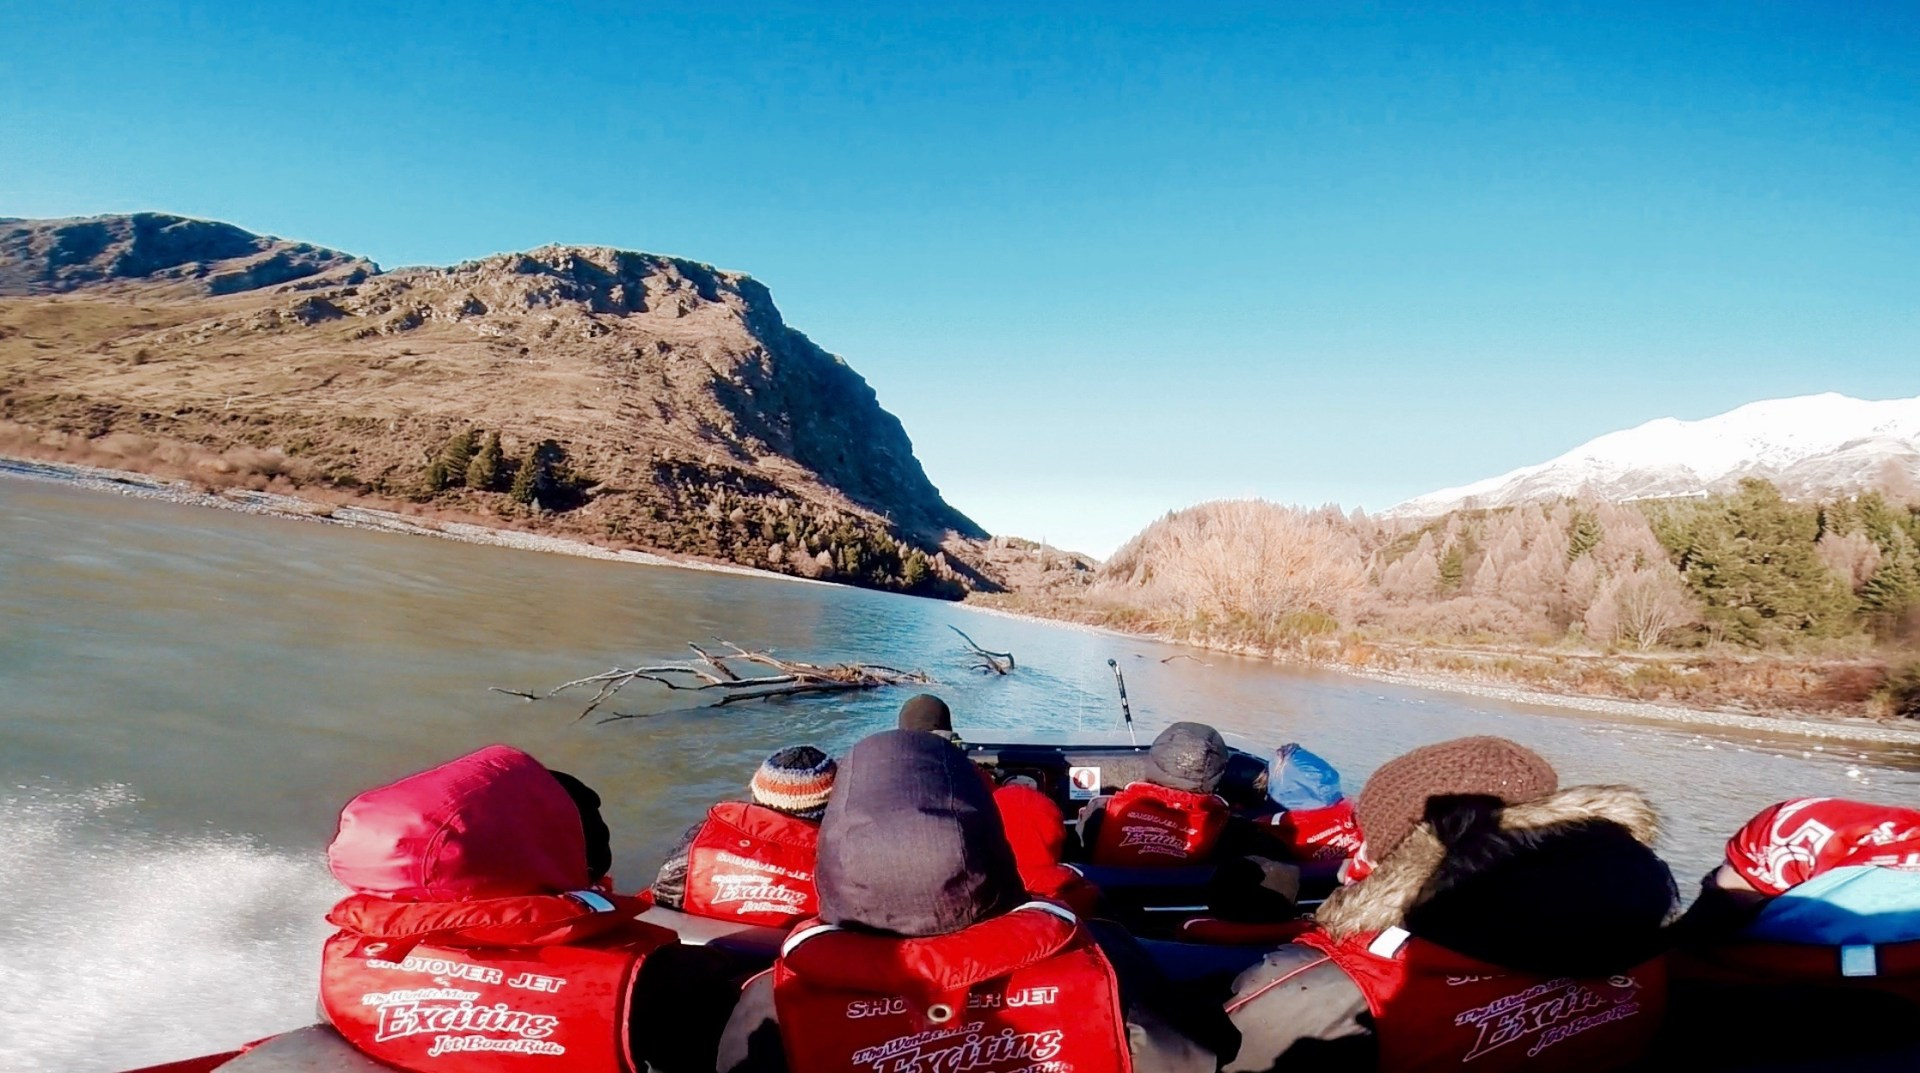 The best adventure activities to try in New Zealand!